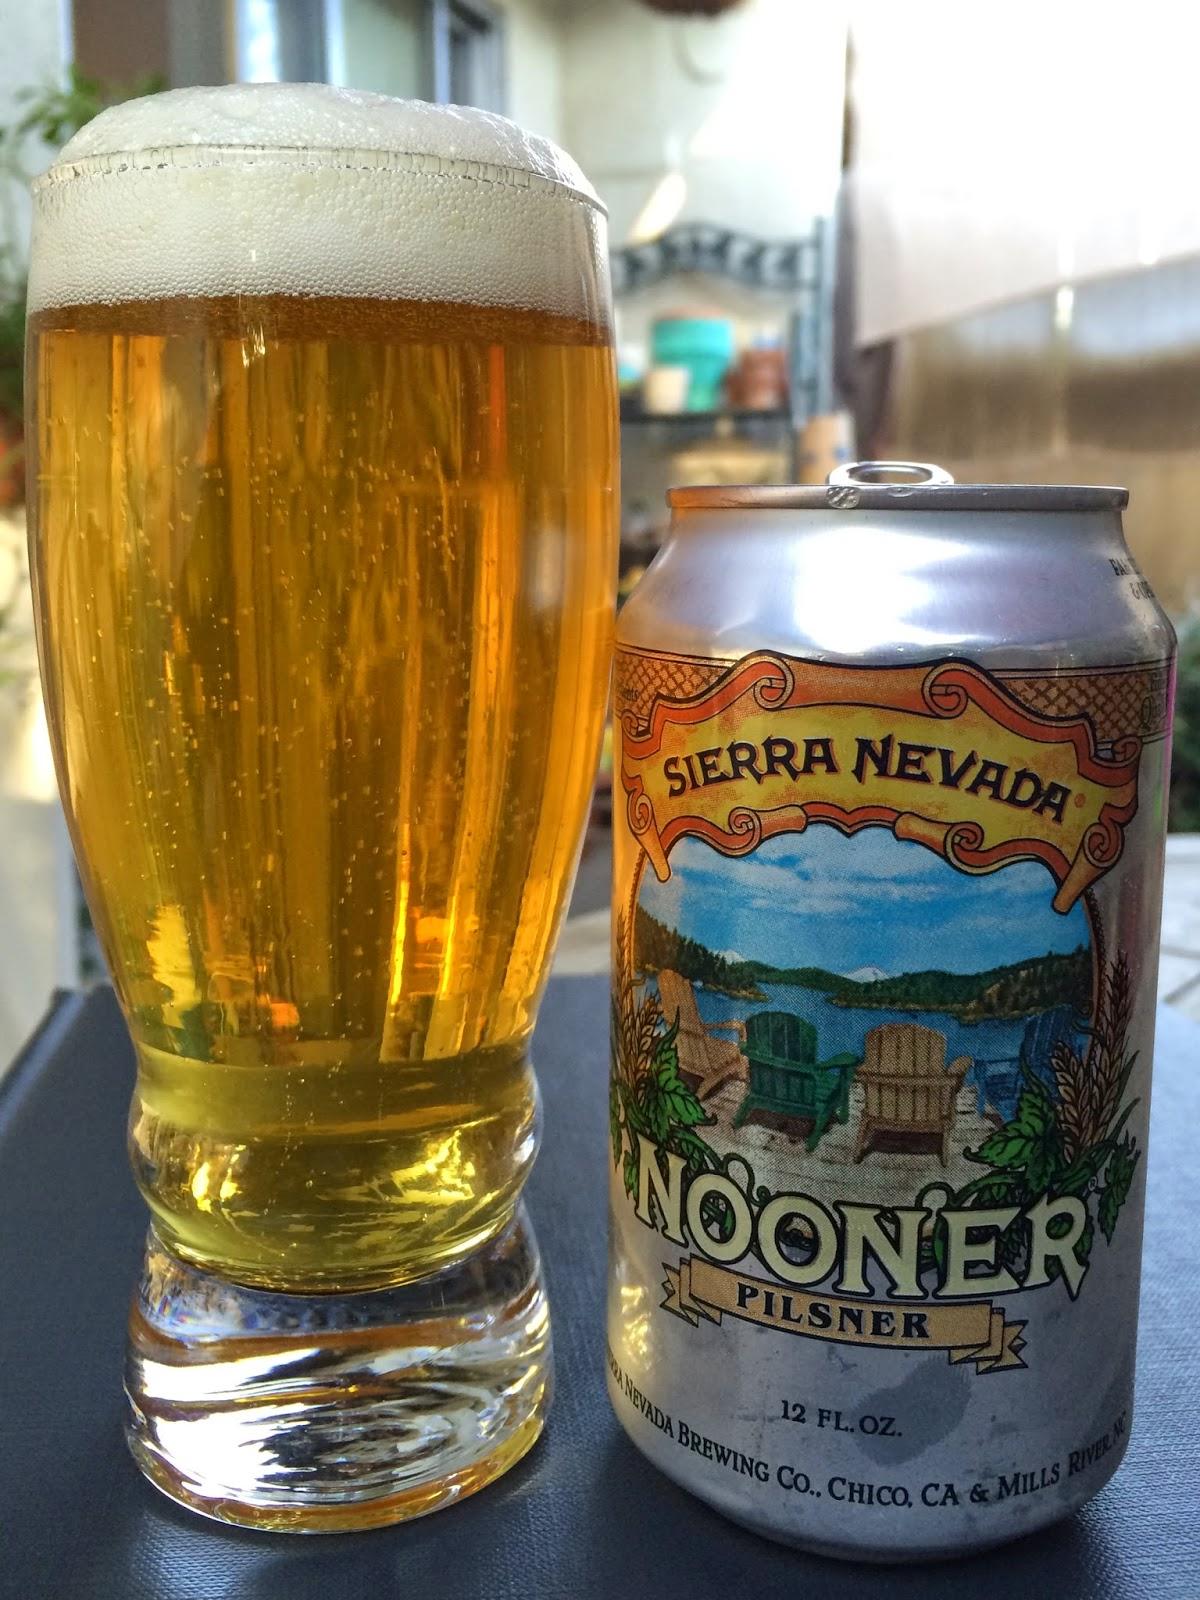 Sierra Nevada Nooner Pilsner 1